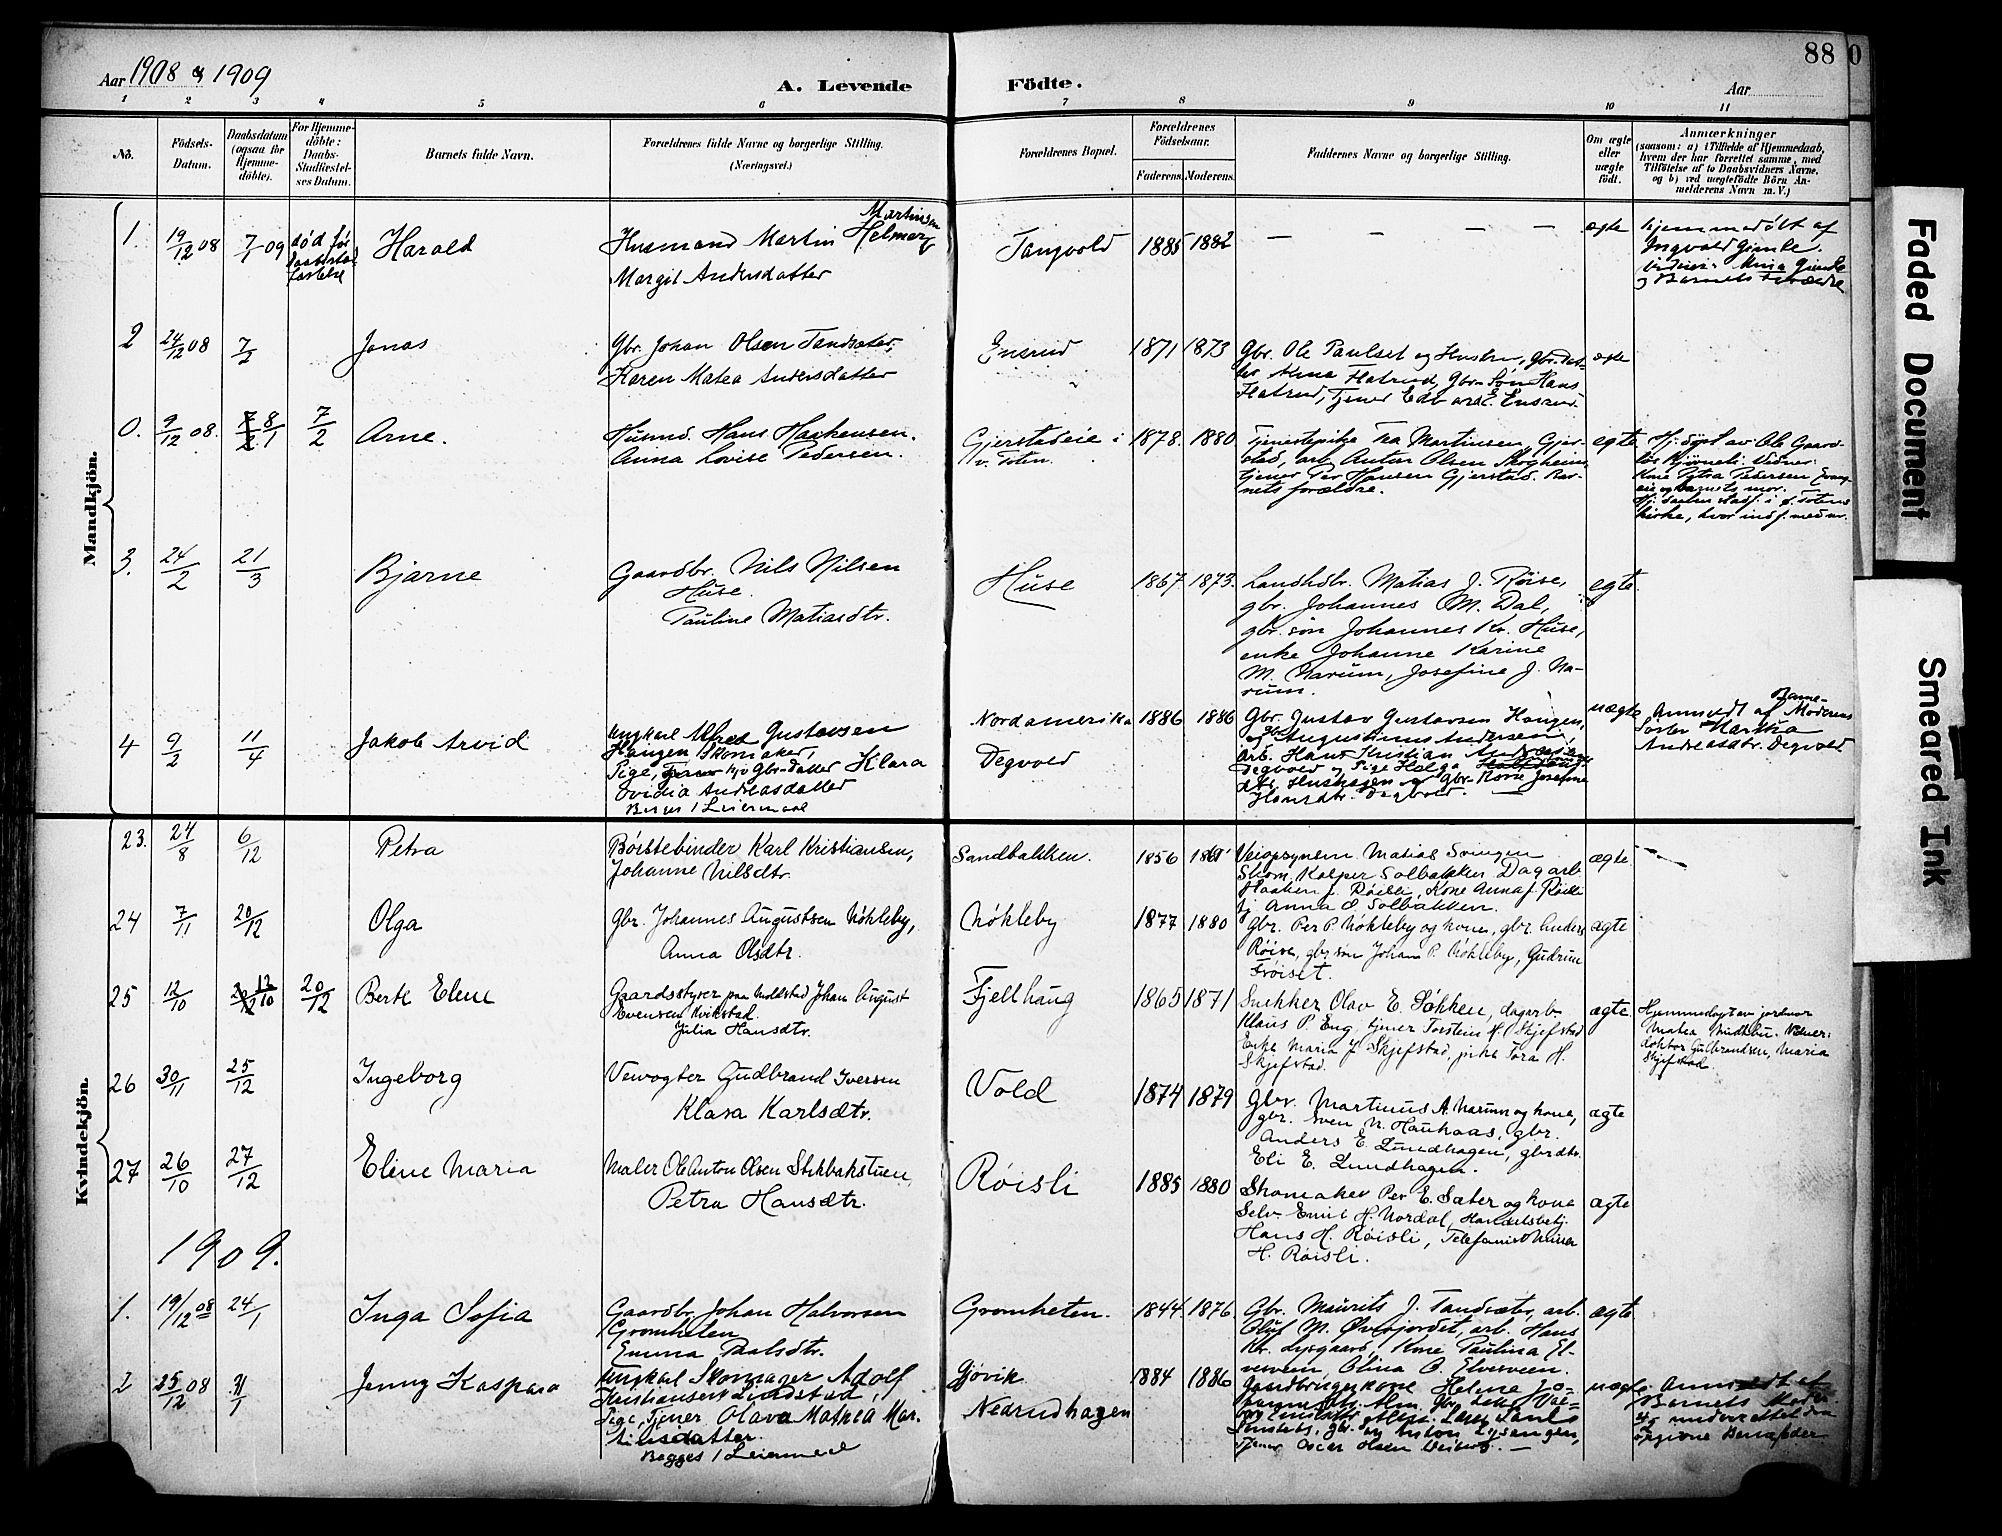 SAH, Vestre Toten prestekontor, H/Ha/Haa/L0013: Ministerialbok nr. 13, 1895-1911, s. 88